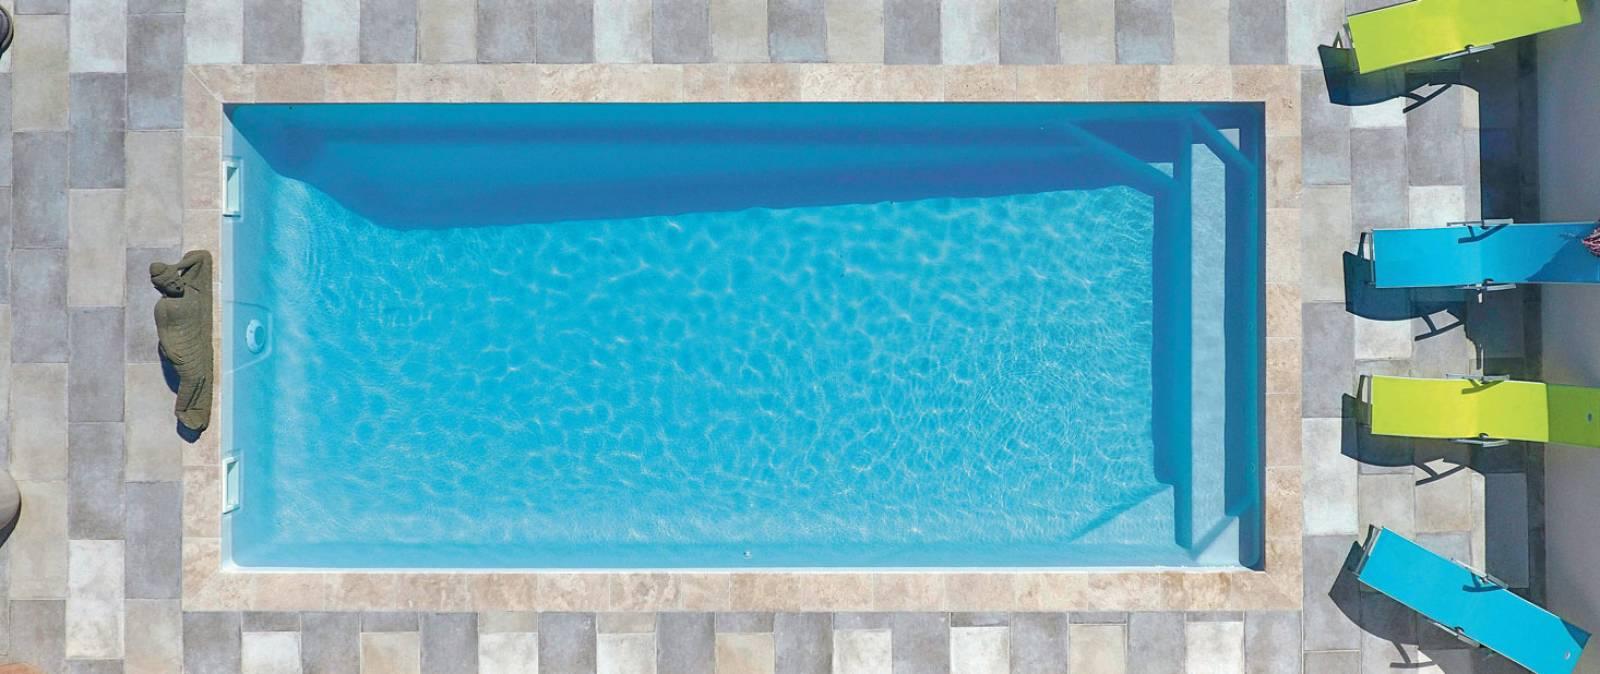 piscine rectangulaire fond inclin kryptonite 8 coque polyester alliance piscines de 8 00m x. Black Bedroom Furniture Sets. Home Design Ideas